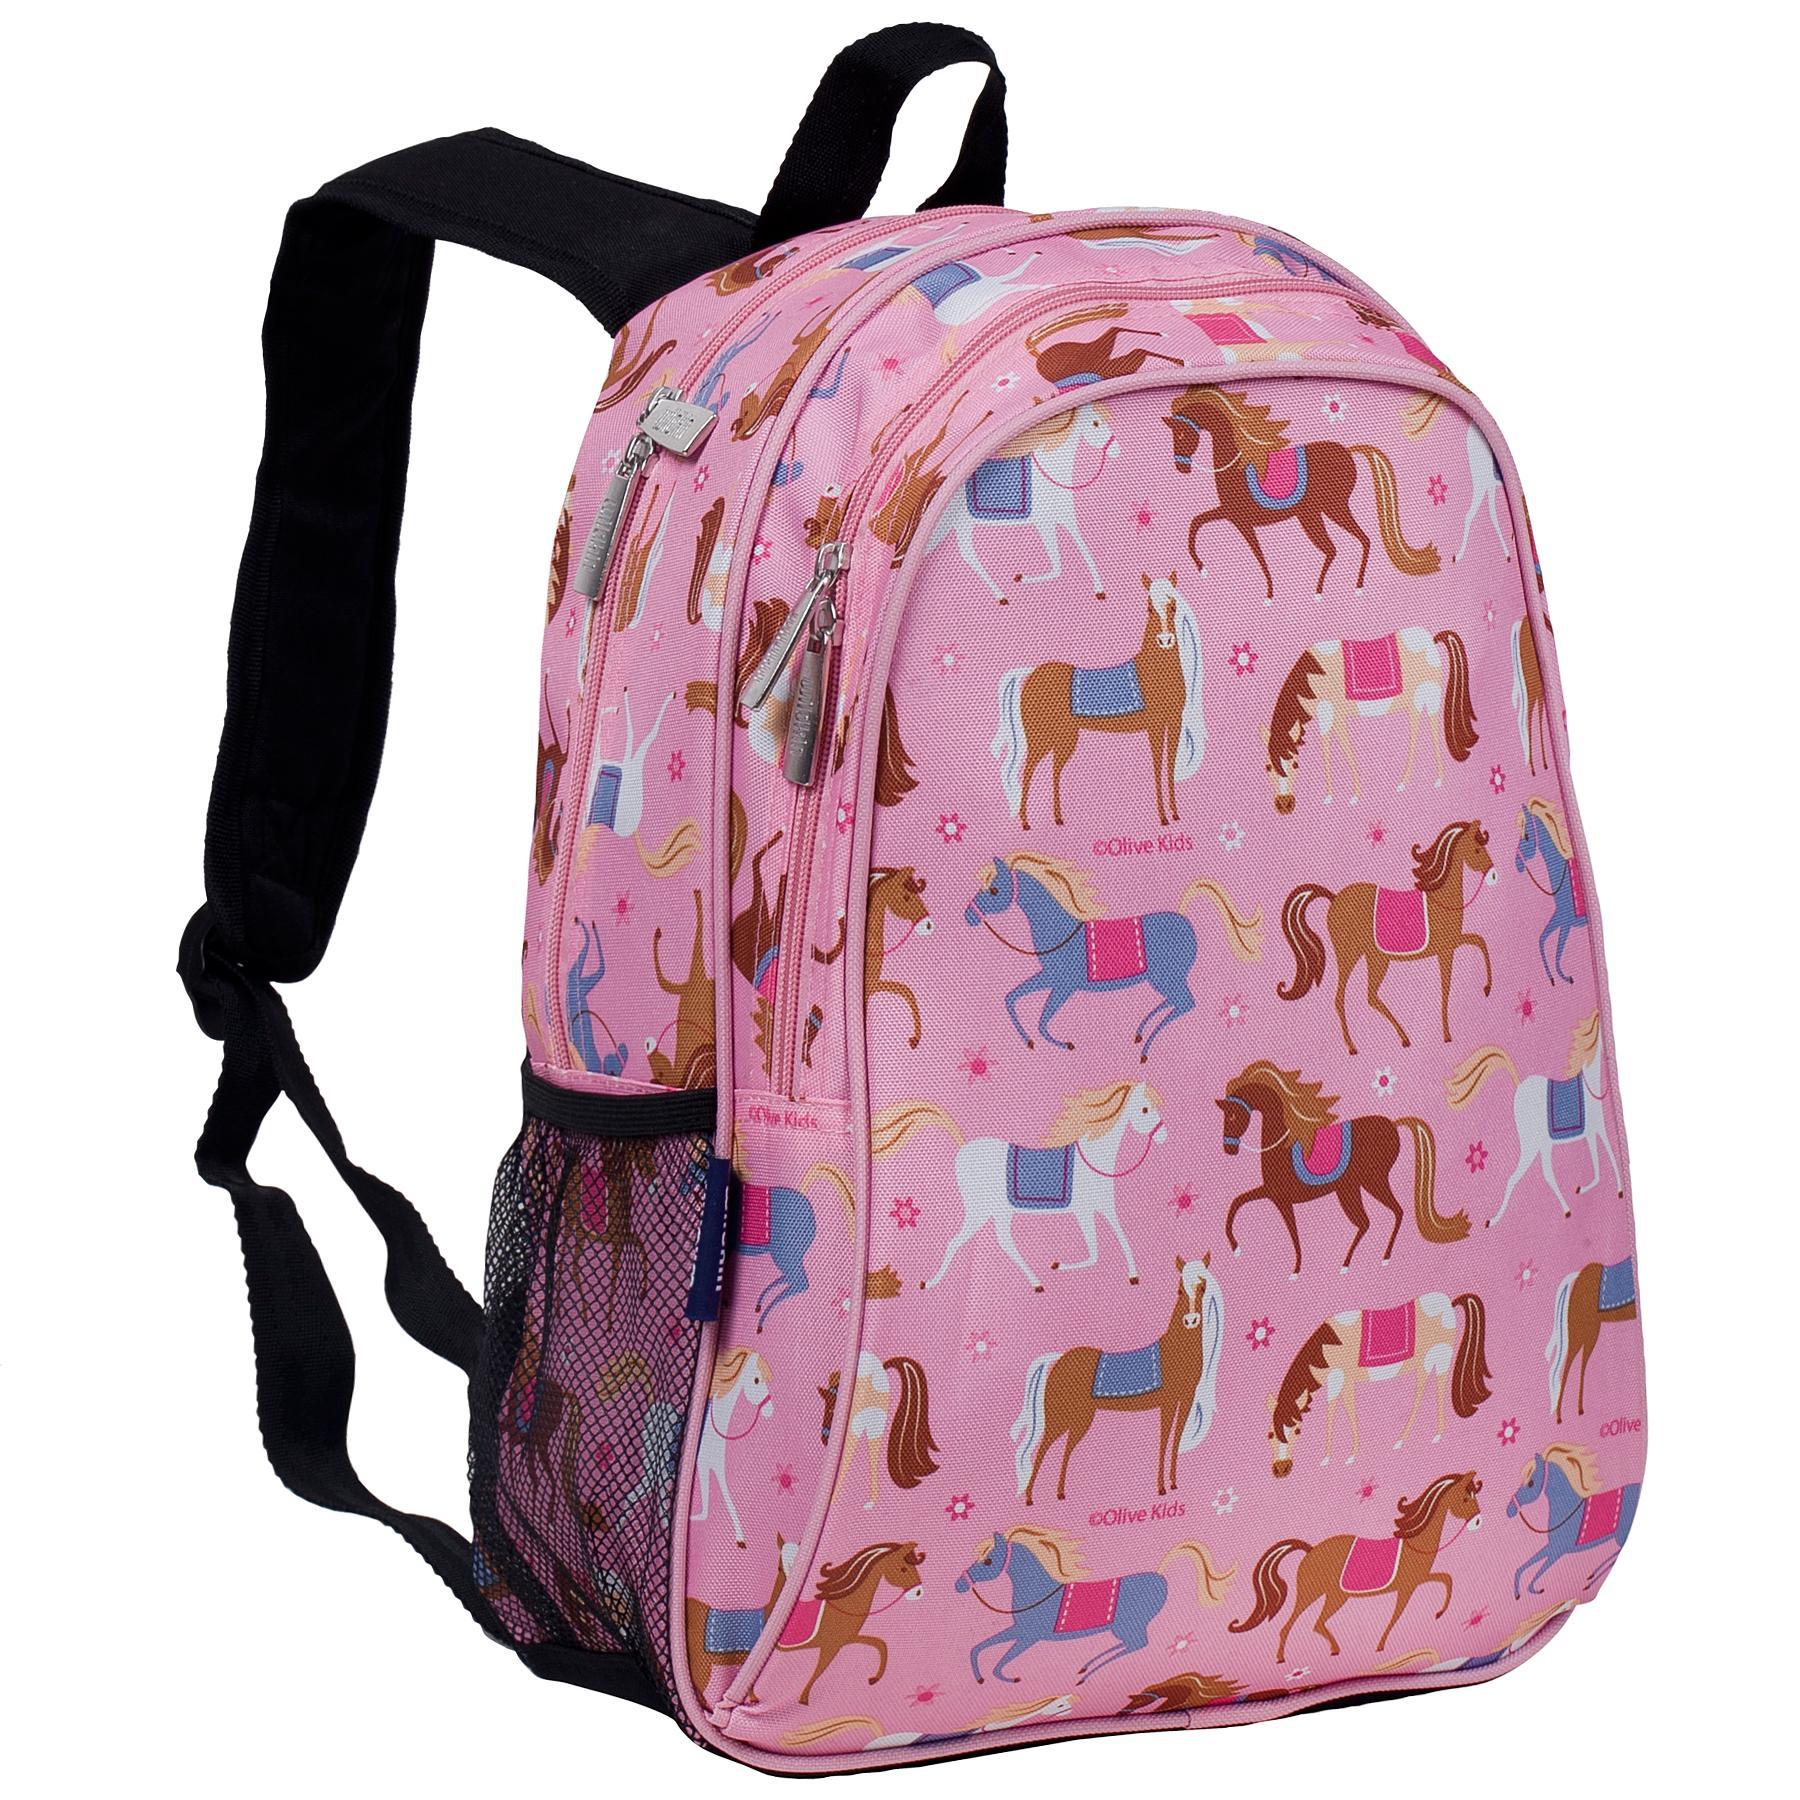 【LOVEBBB】美國 Wildkin 67708 凱莉小馬 兒童後背包/雙層式便利書包